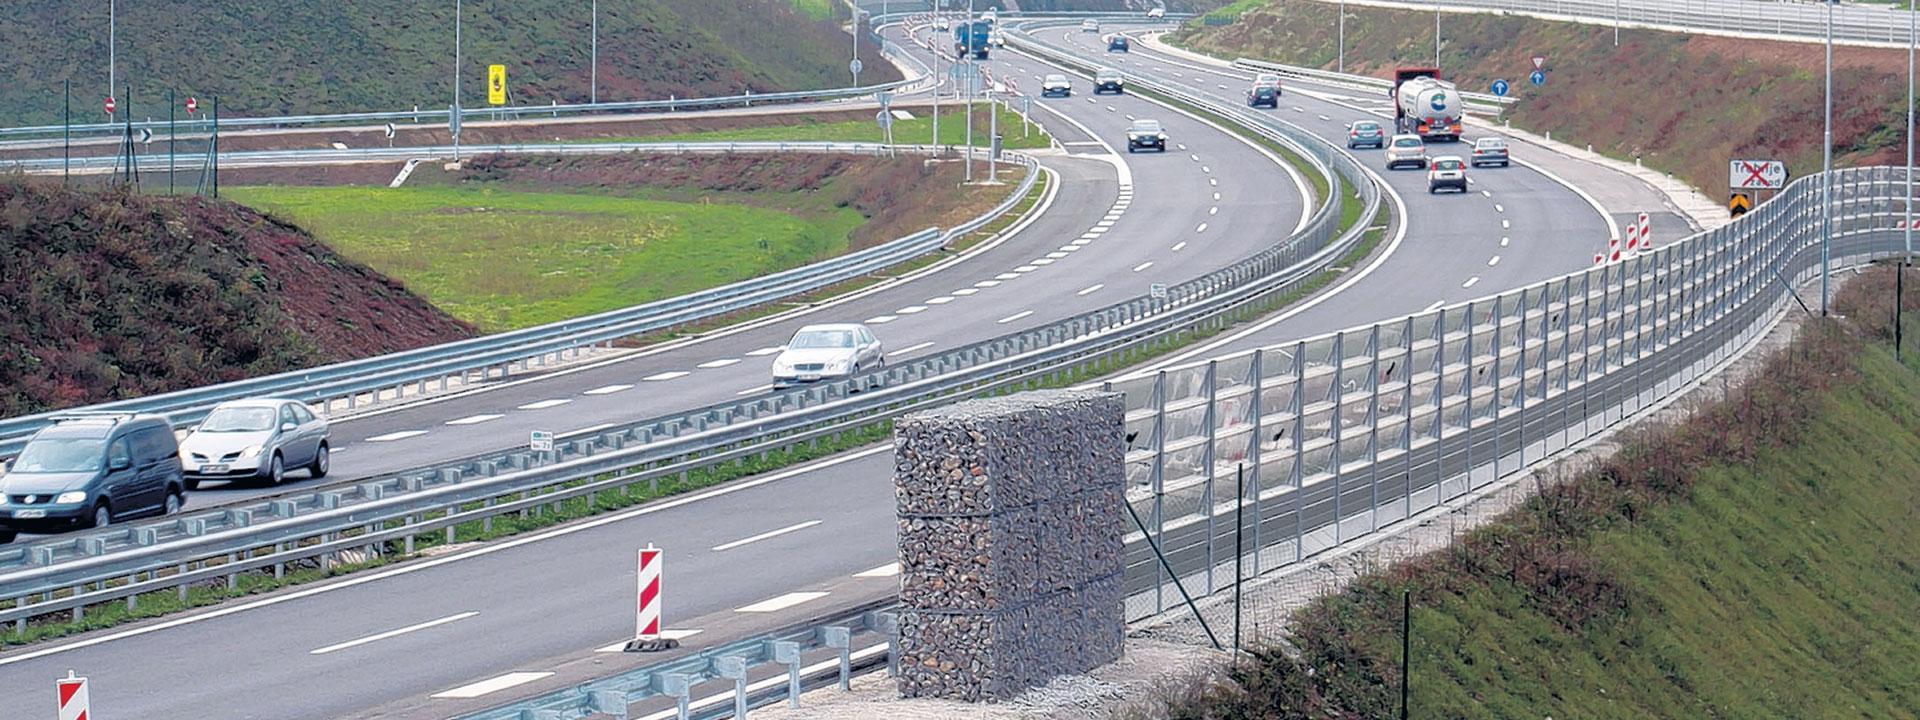 Cestne varnostne ograje